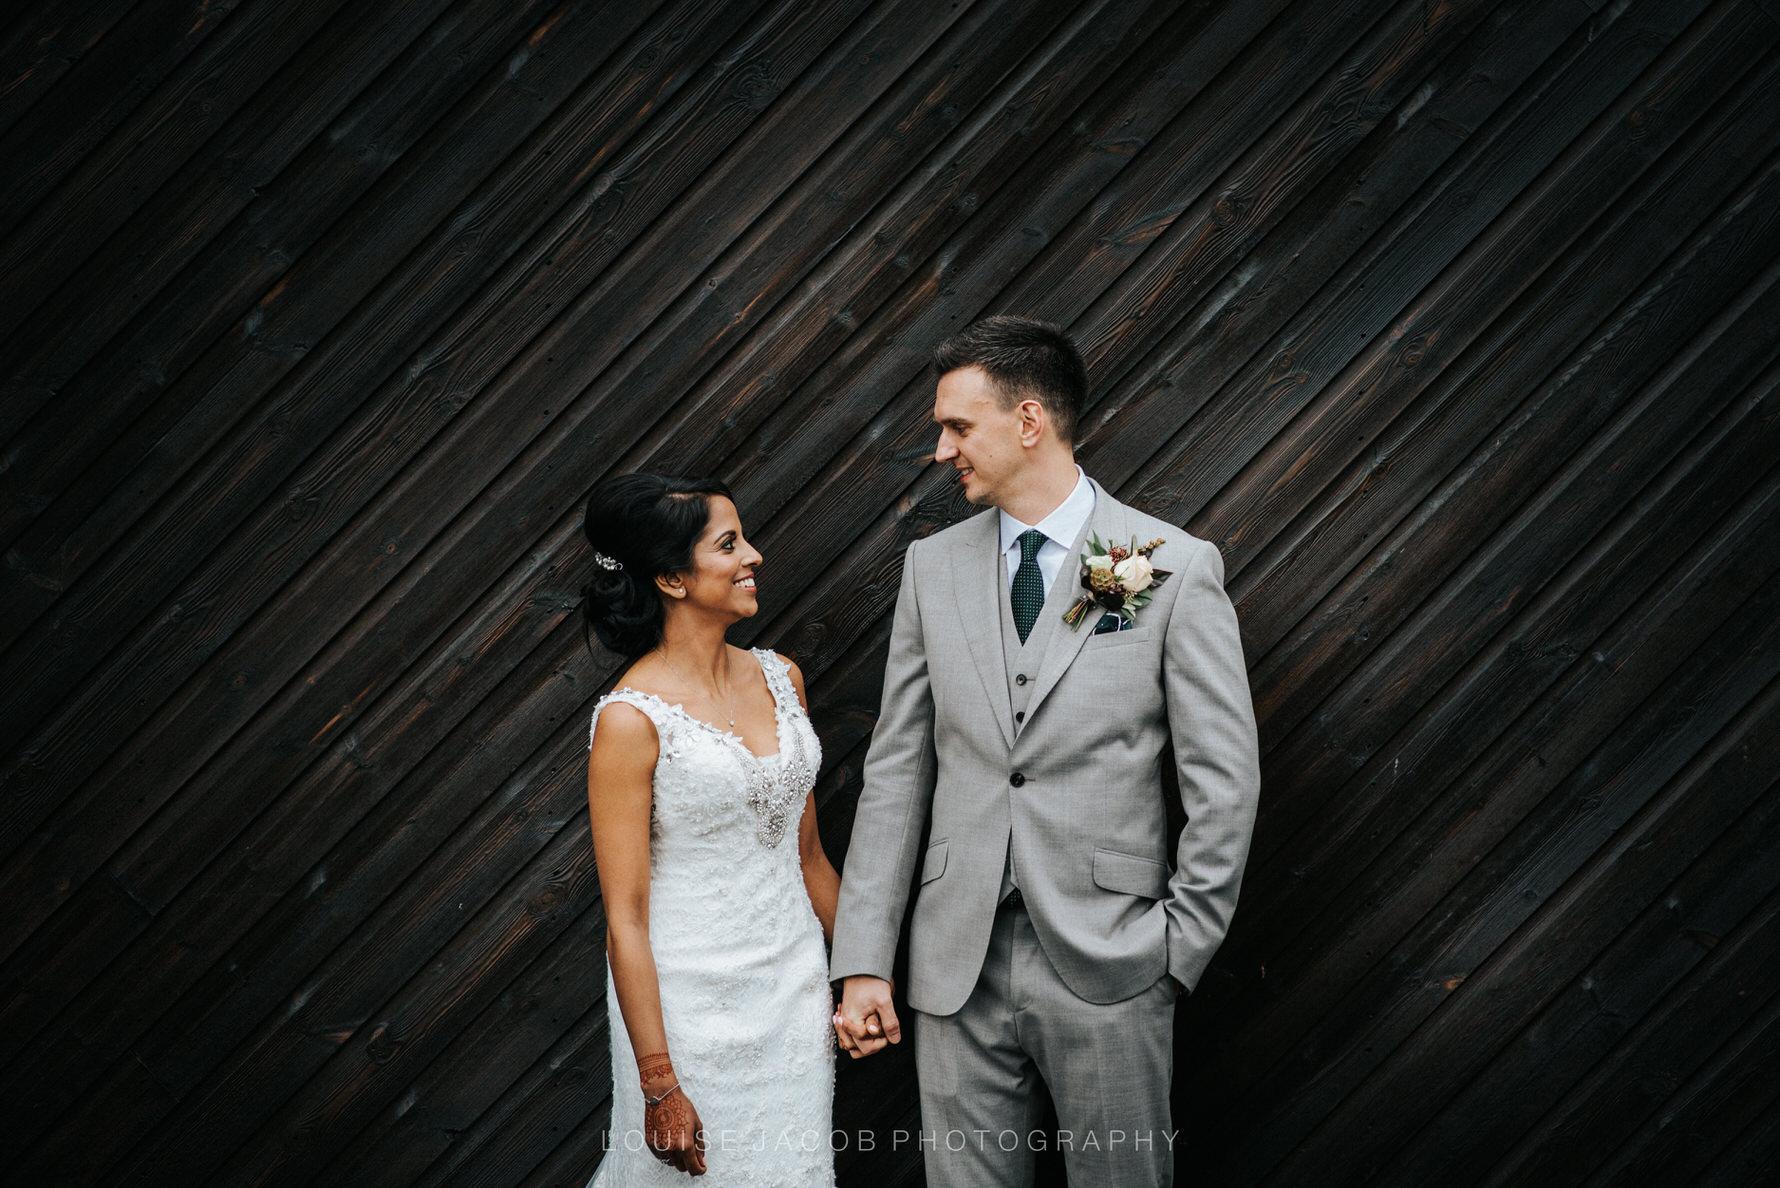 Cheshire Wedding Photography at Colshaw Hall